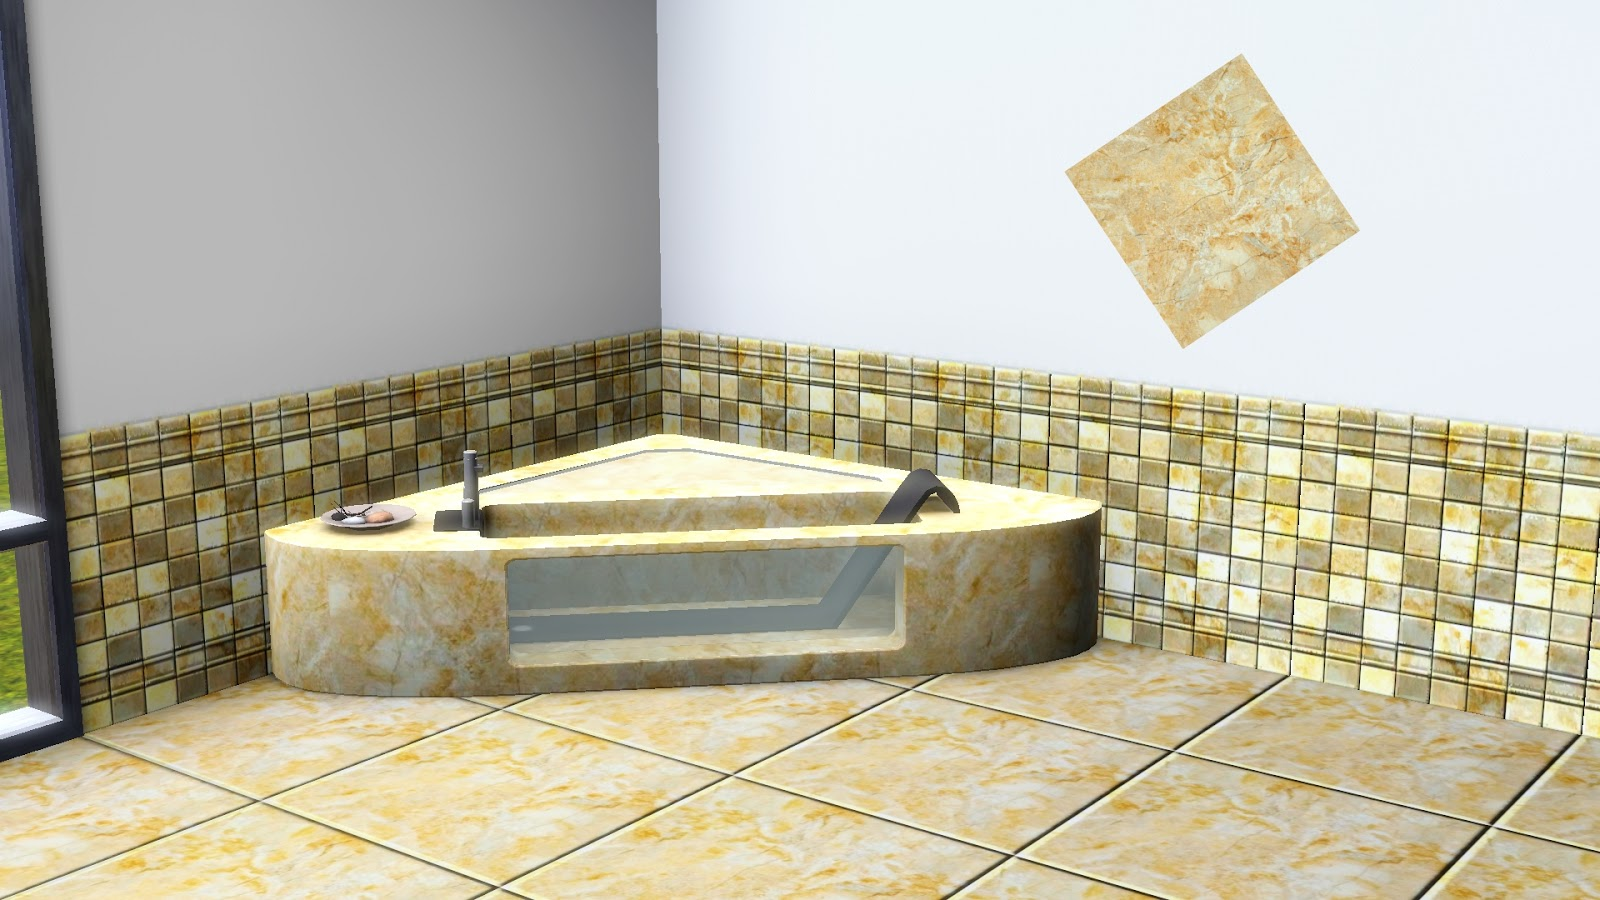 19 sims 3 blog marmor fliesen muster set 2. Black Bedroom Furniture Sets. Home Design Ideas